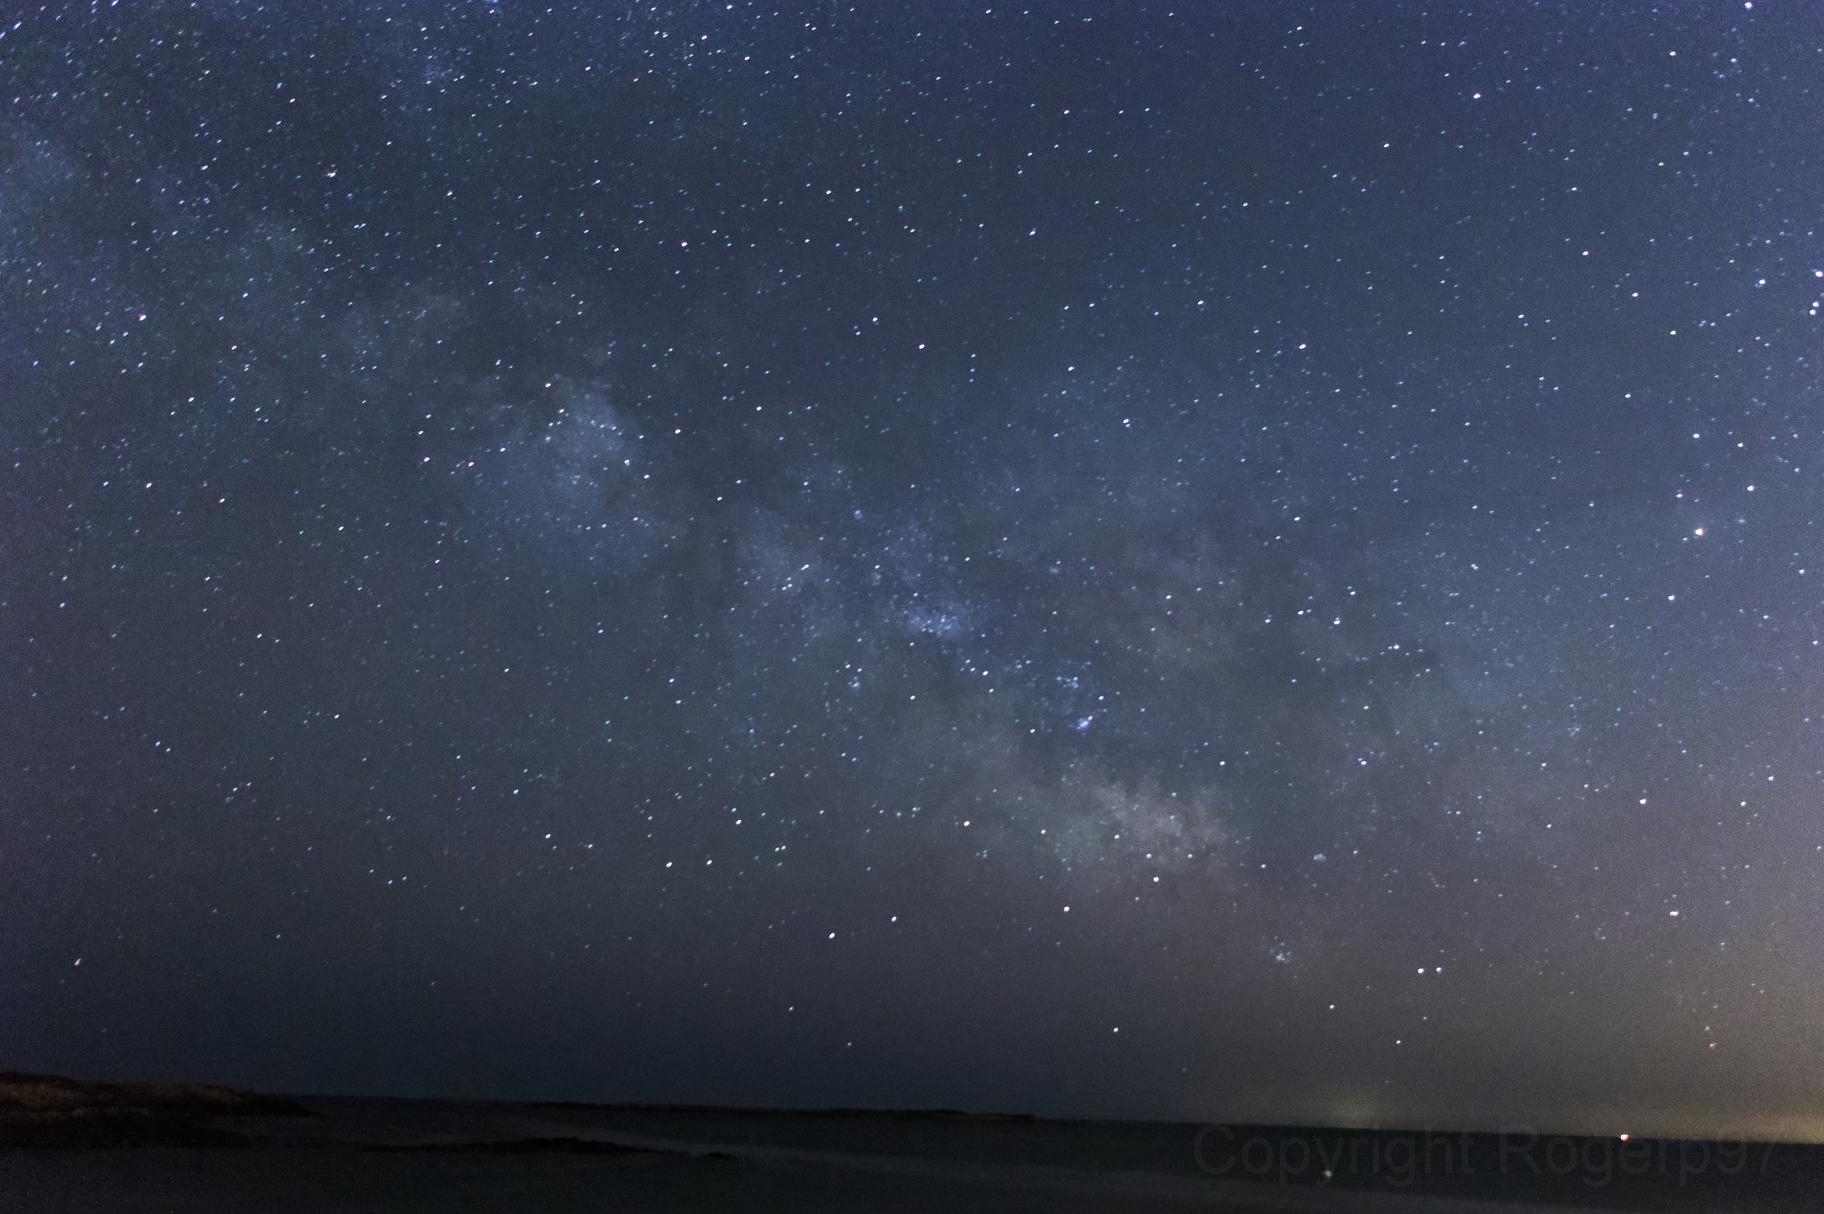 Milky Way over Pebble Beach